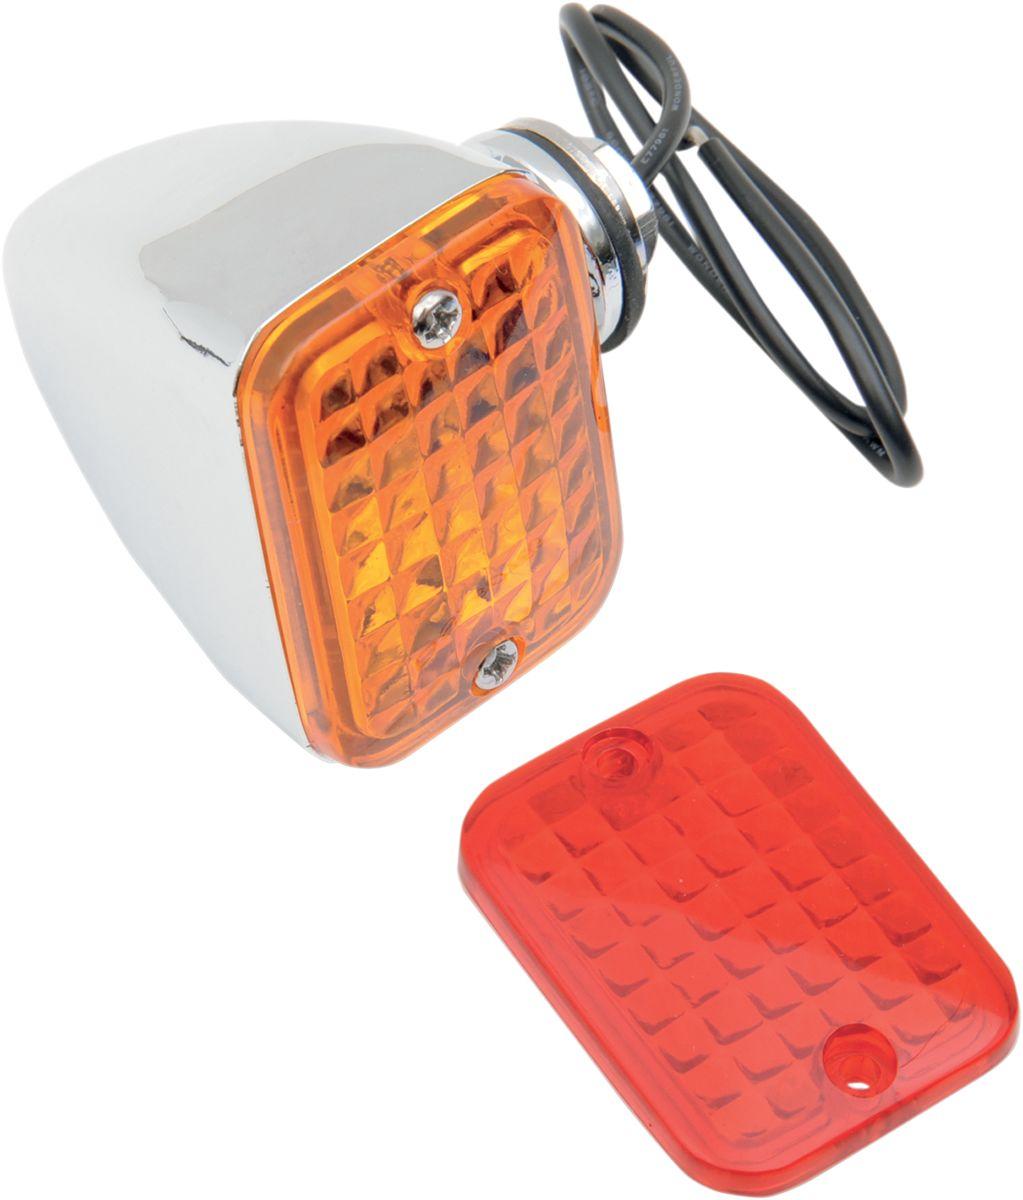 【Drag Specialties】位置燈/單 FIL 【LIGHT M/MARKER SINGLE FIL [DS-280163]】 - 「Webike-摩托百貨」